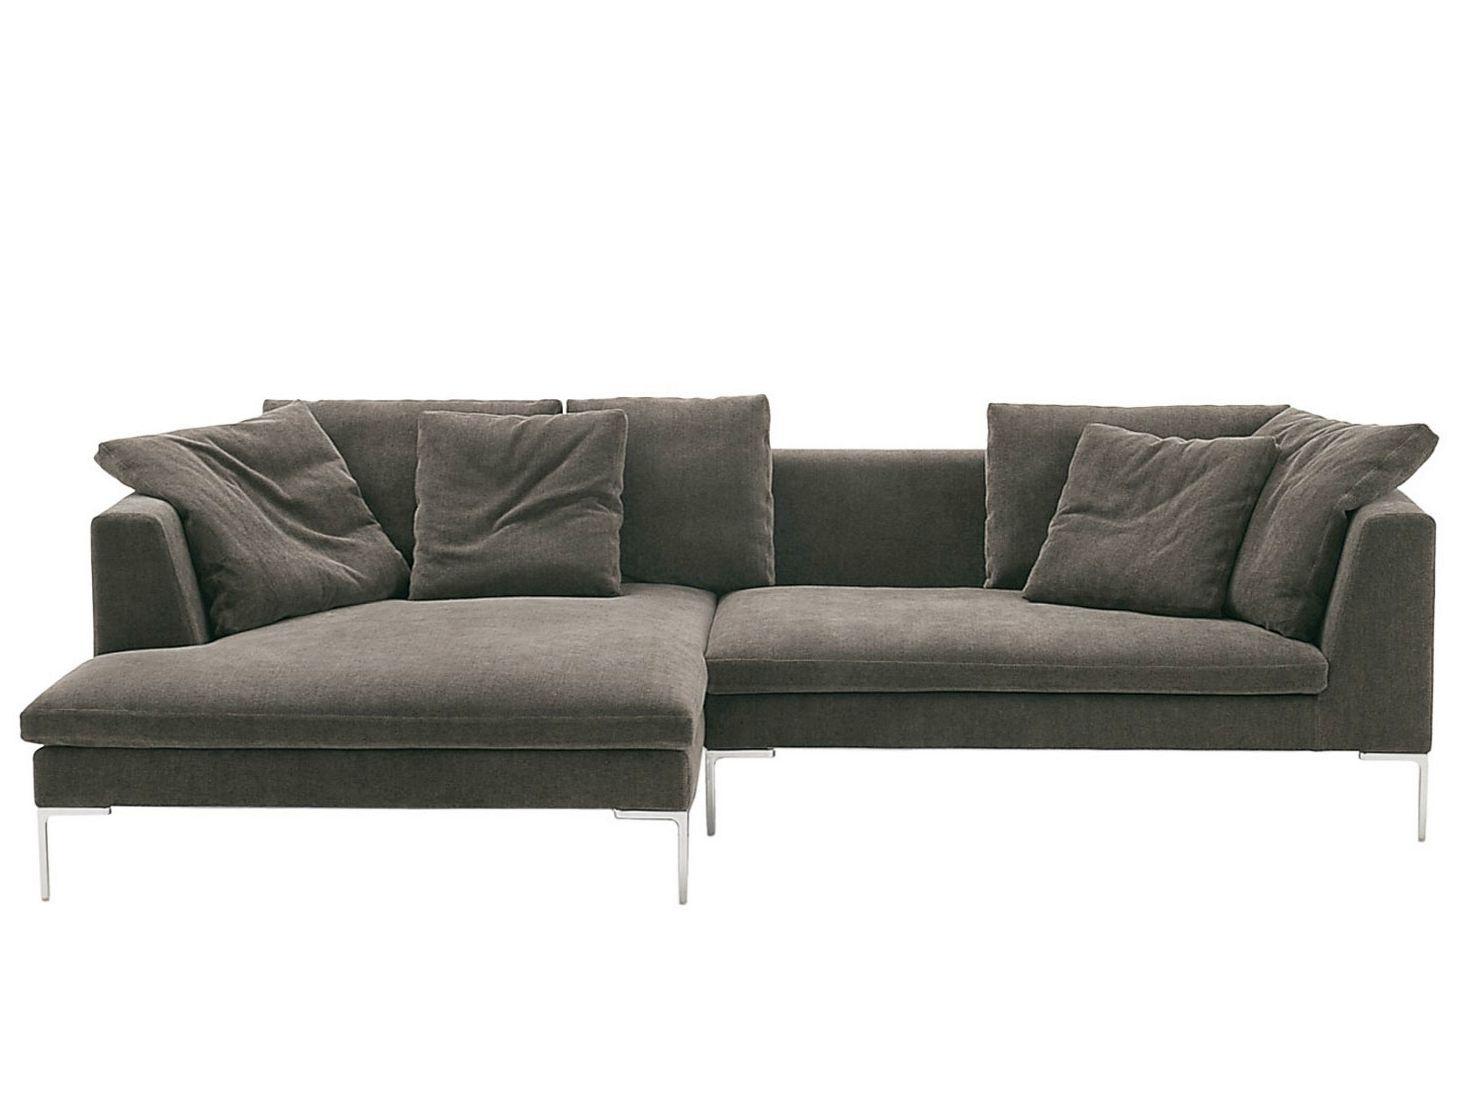 Charles Large Corner Sofa By B B Italia Design Antonio Citterio